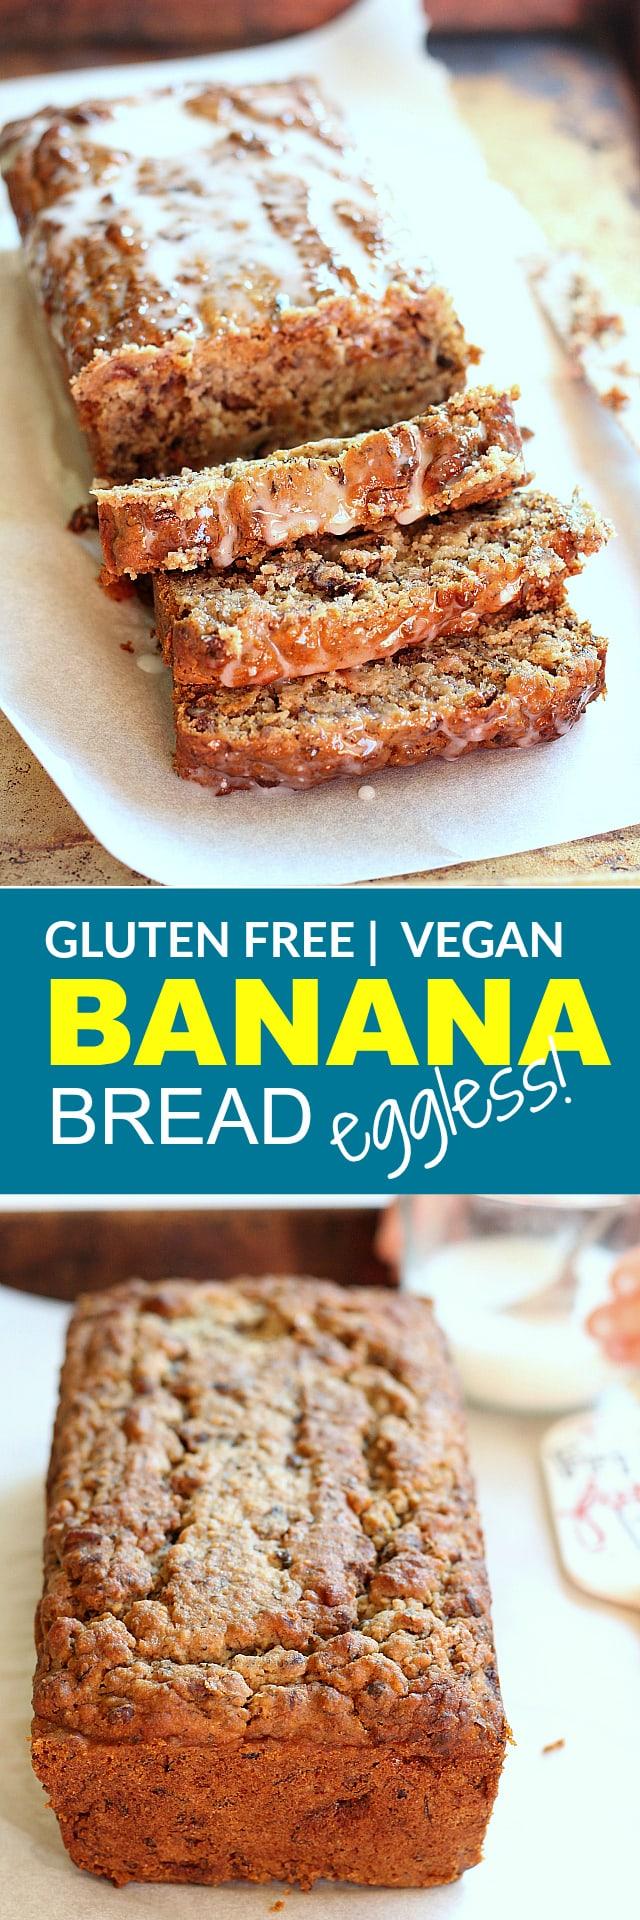 Eggless Banana Bread | Gluten Free | Vegan | One Bowl!!! | Delightful Mom Food